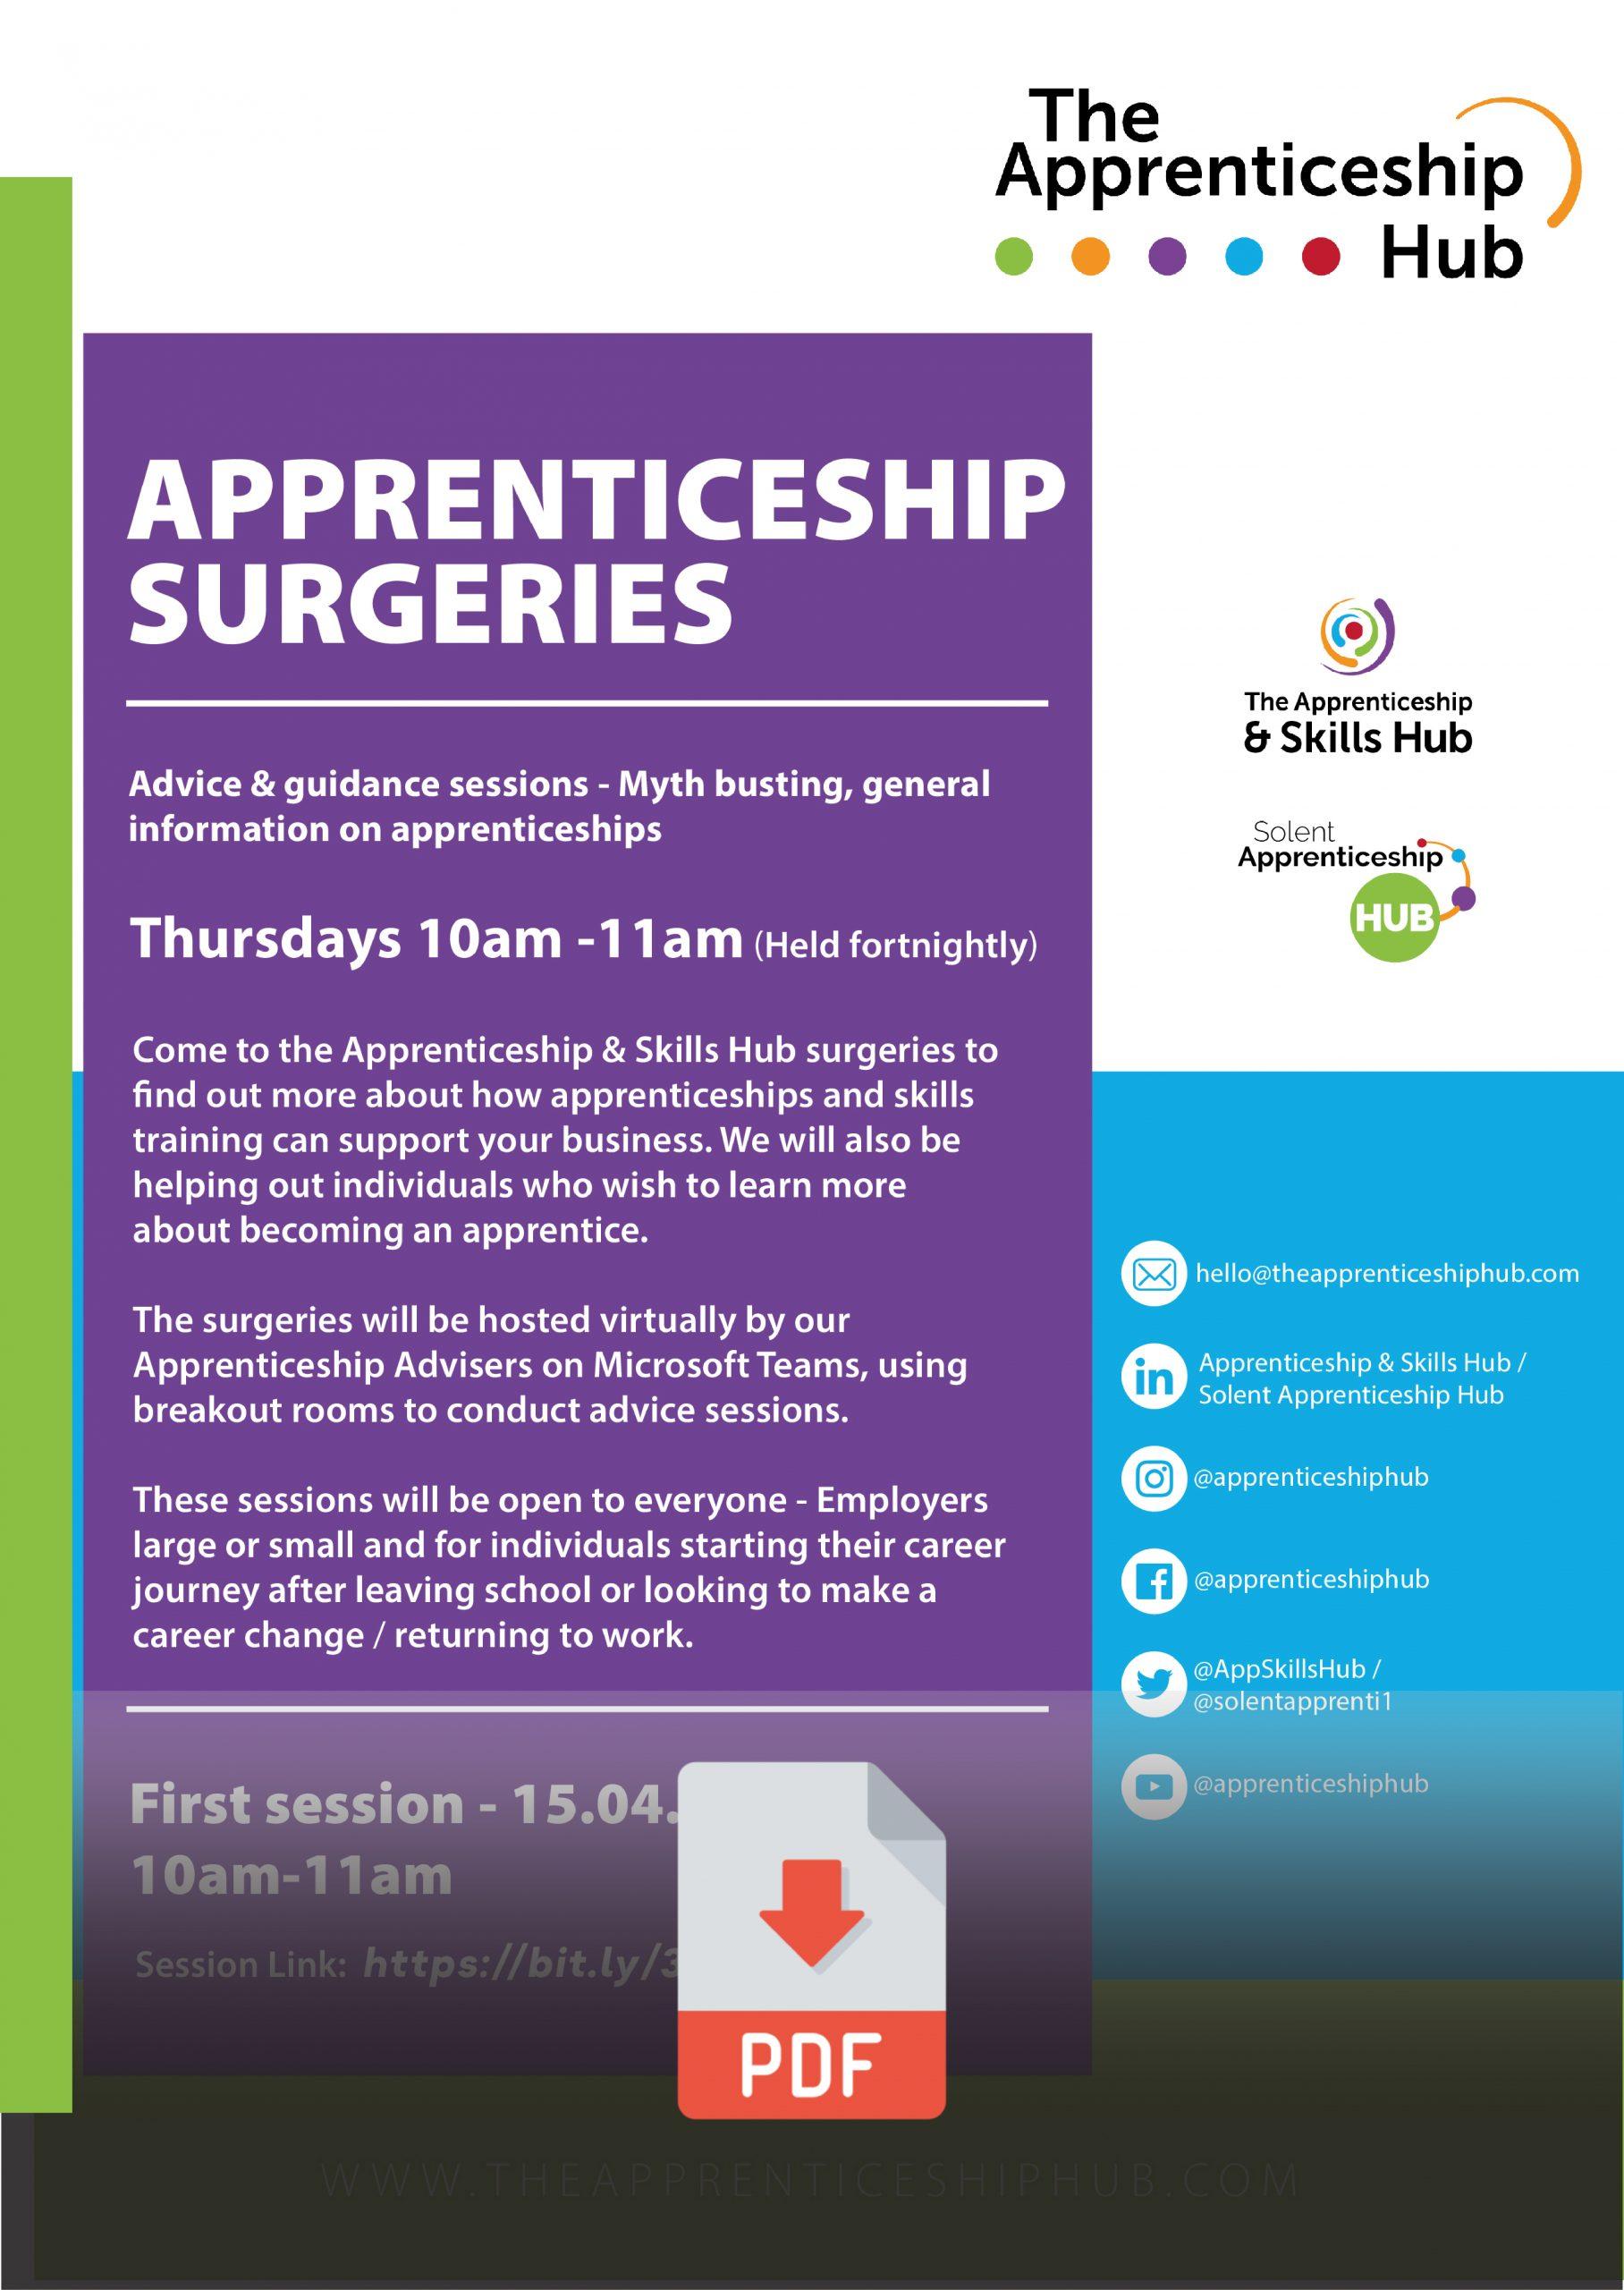 Apprenticeship Surgeries - The Apprenticeship Hub